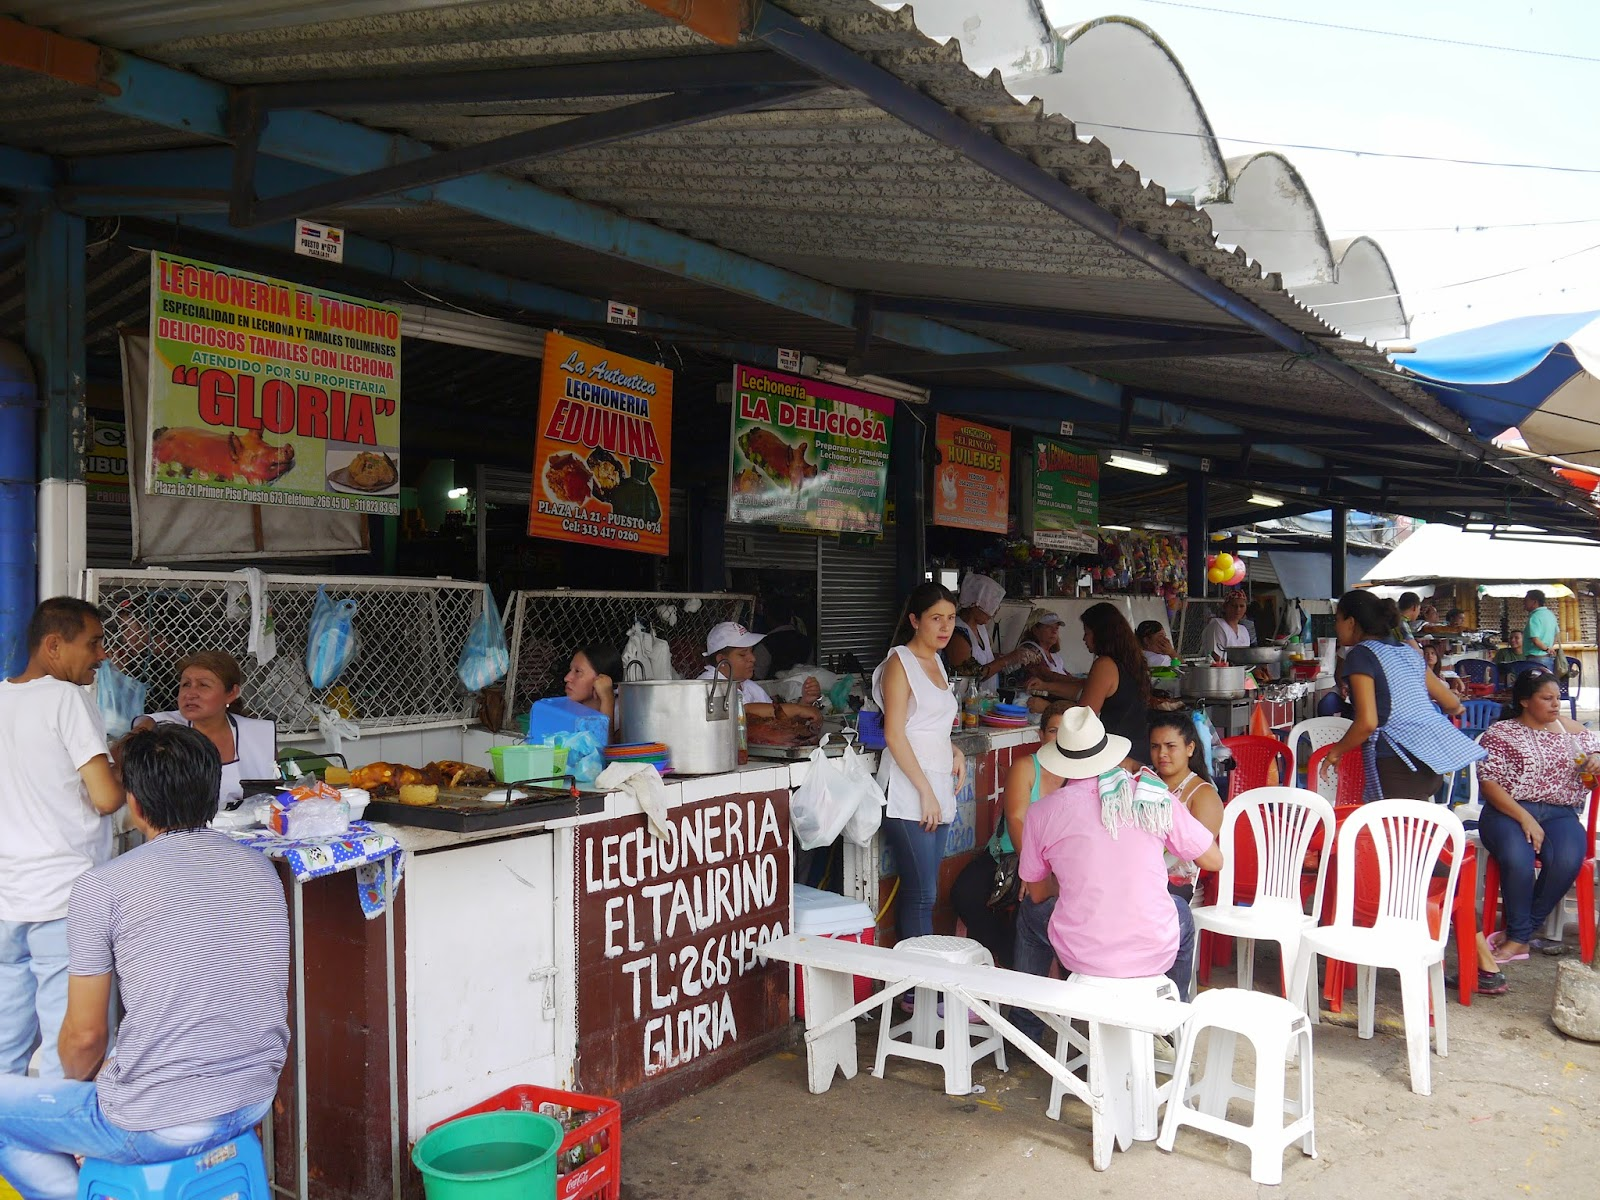 Lechoneria Plaza De Mercado La 21